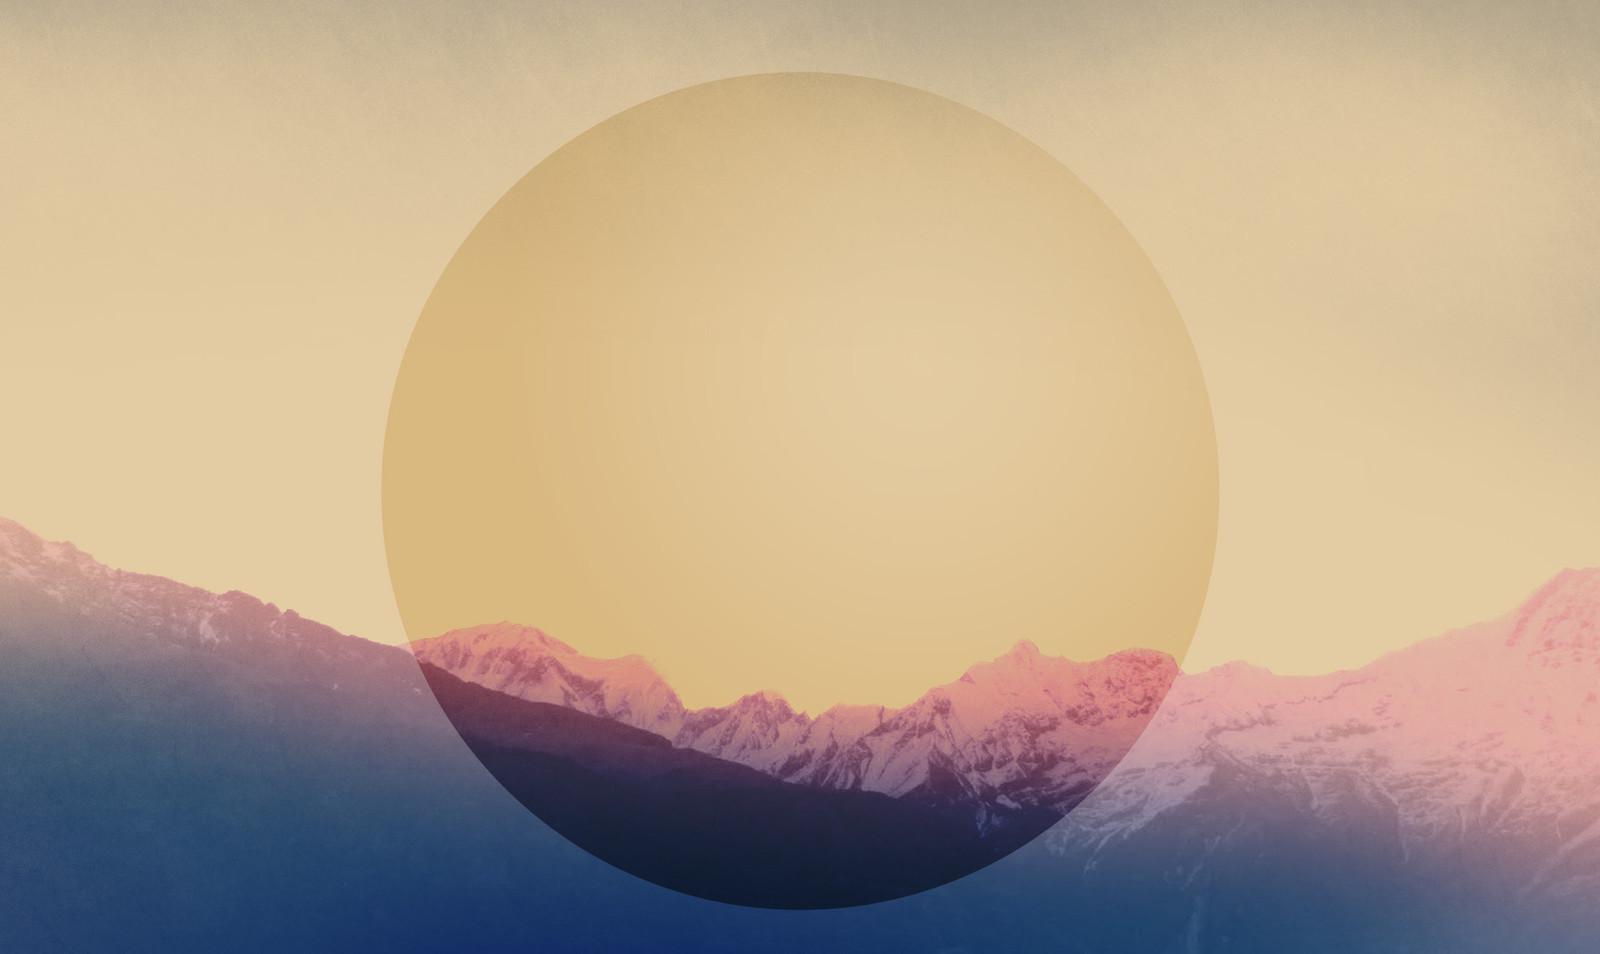 lina grace guided sleep meditation for insomnia